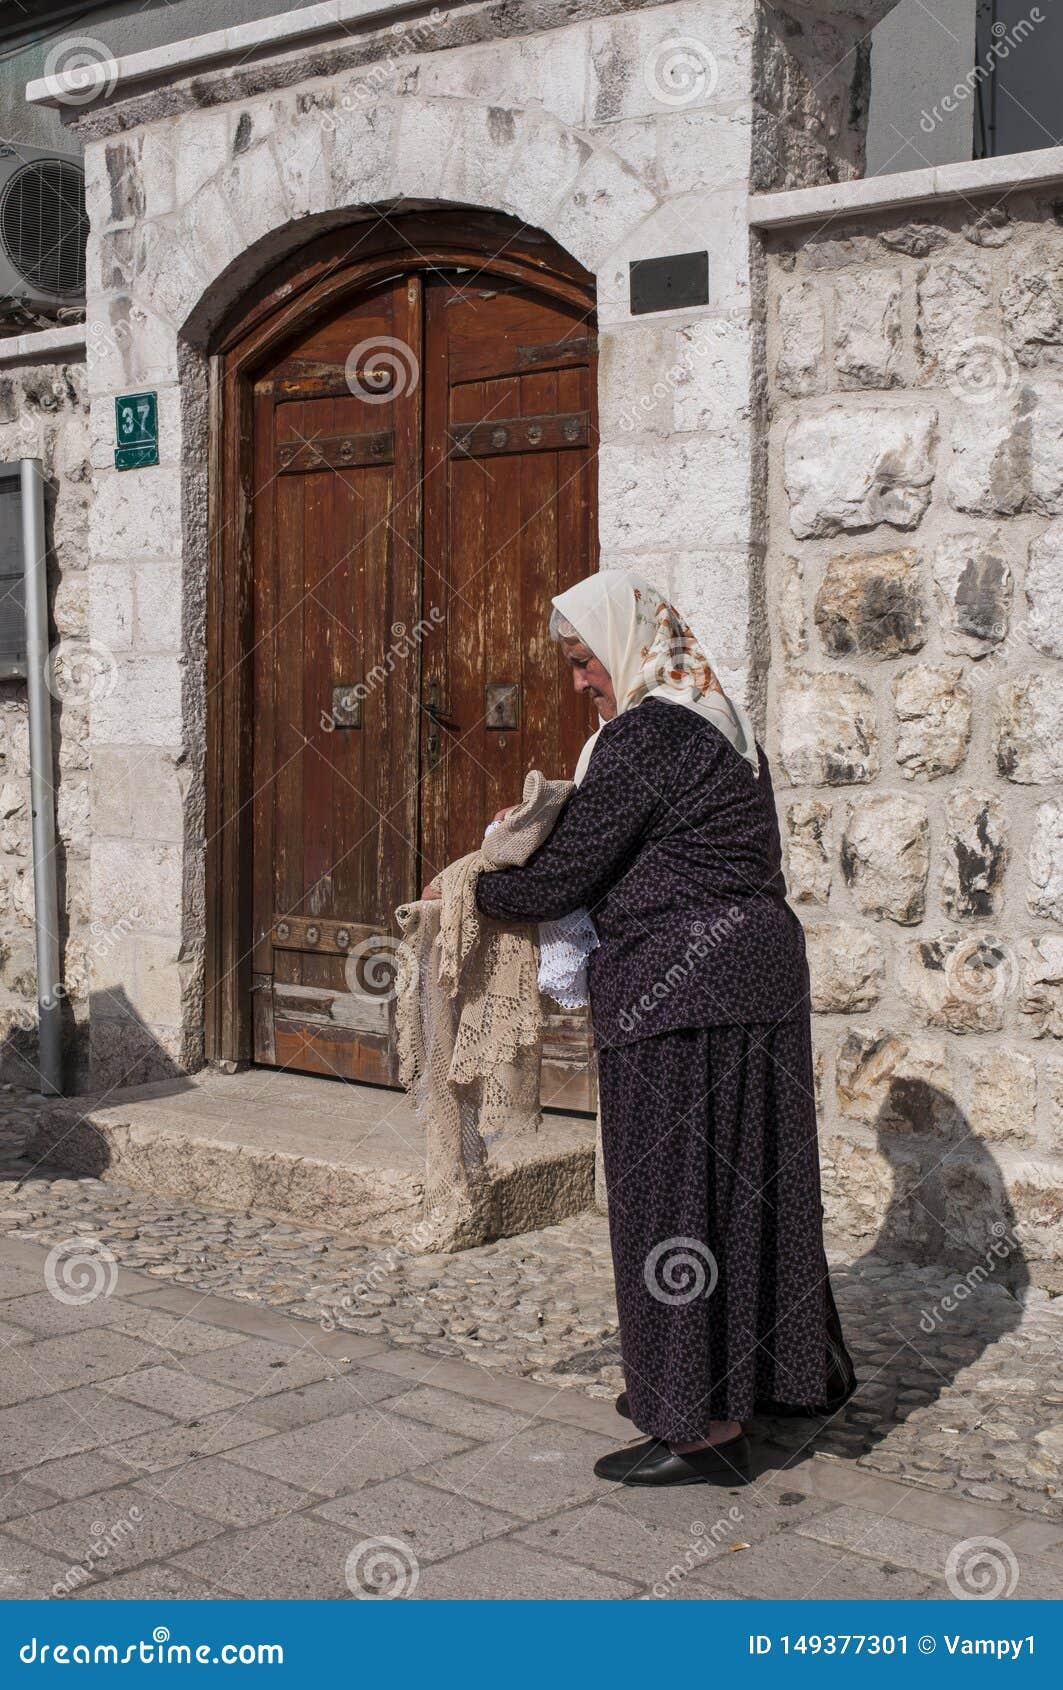 Sarajevo, Bosnia and Herzegovina, Bascarsija, neighborhood, old town, district, square, people, bazaar, market, woman